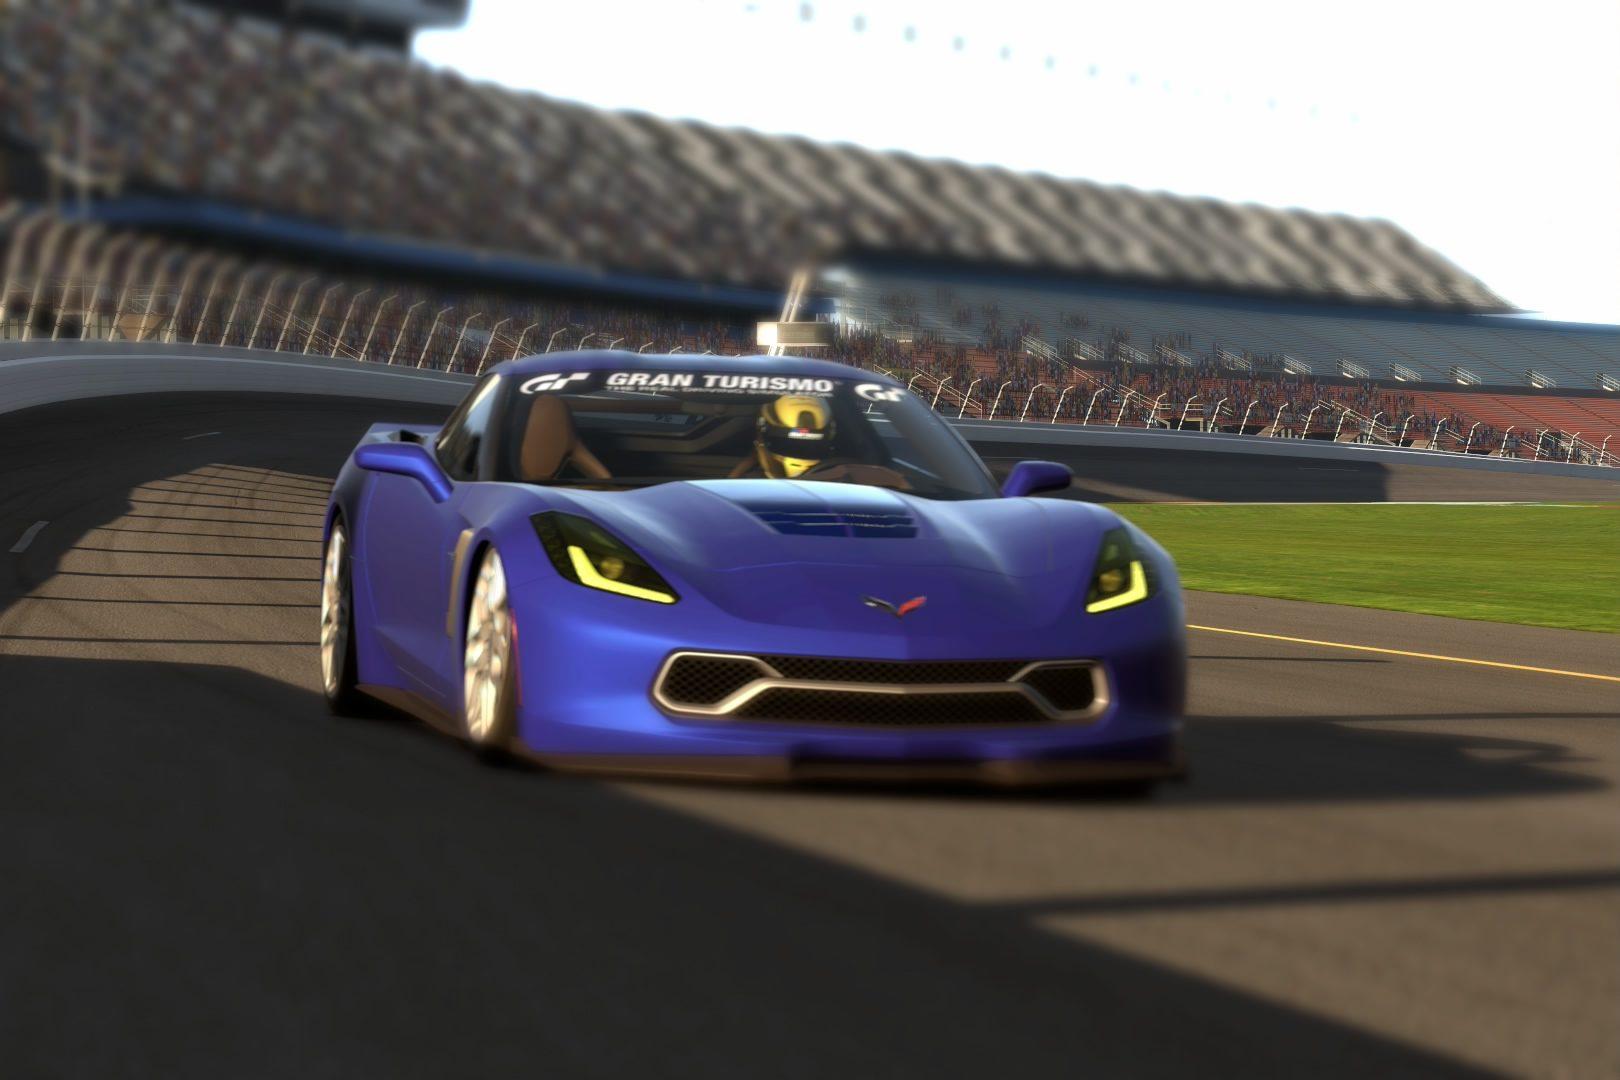 Chevrolet Corvette Stingray Gran Turismo Concept '13.jpg